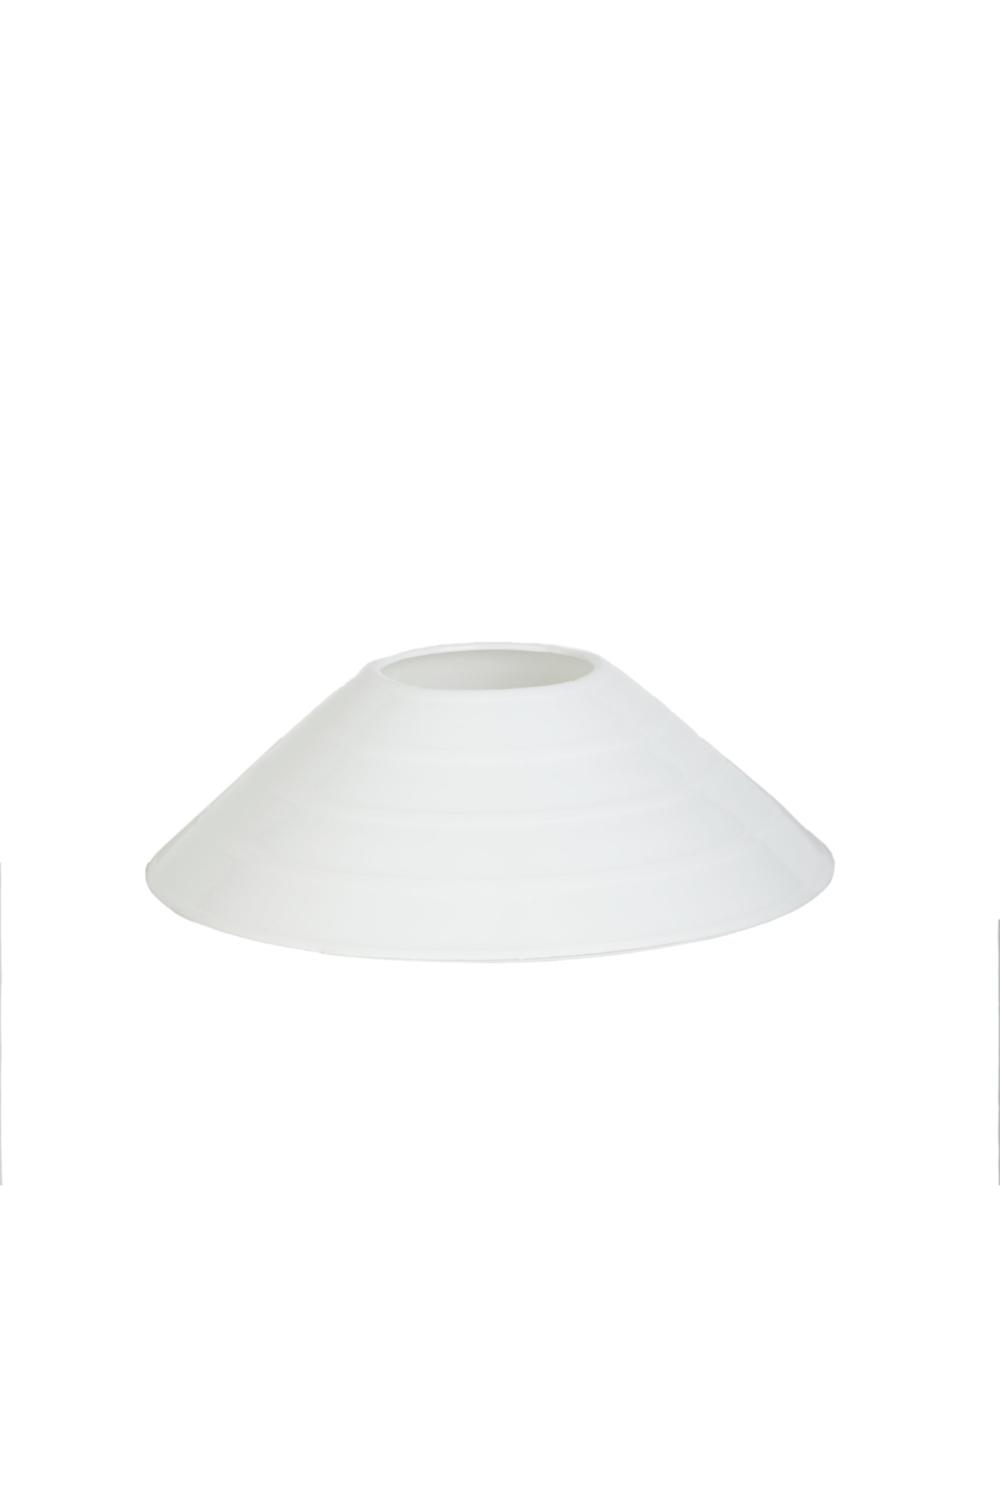 Soccer Cone White.jpg